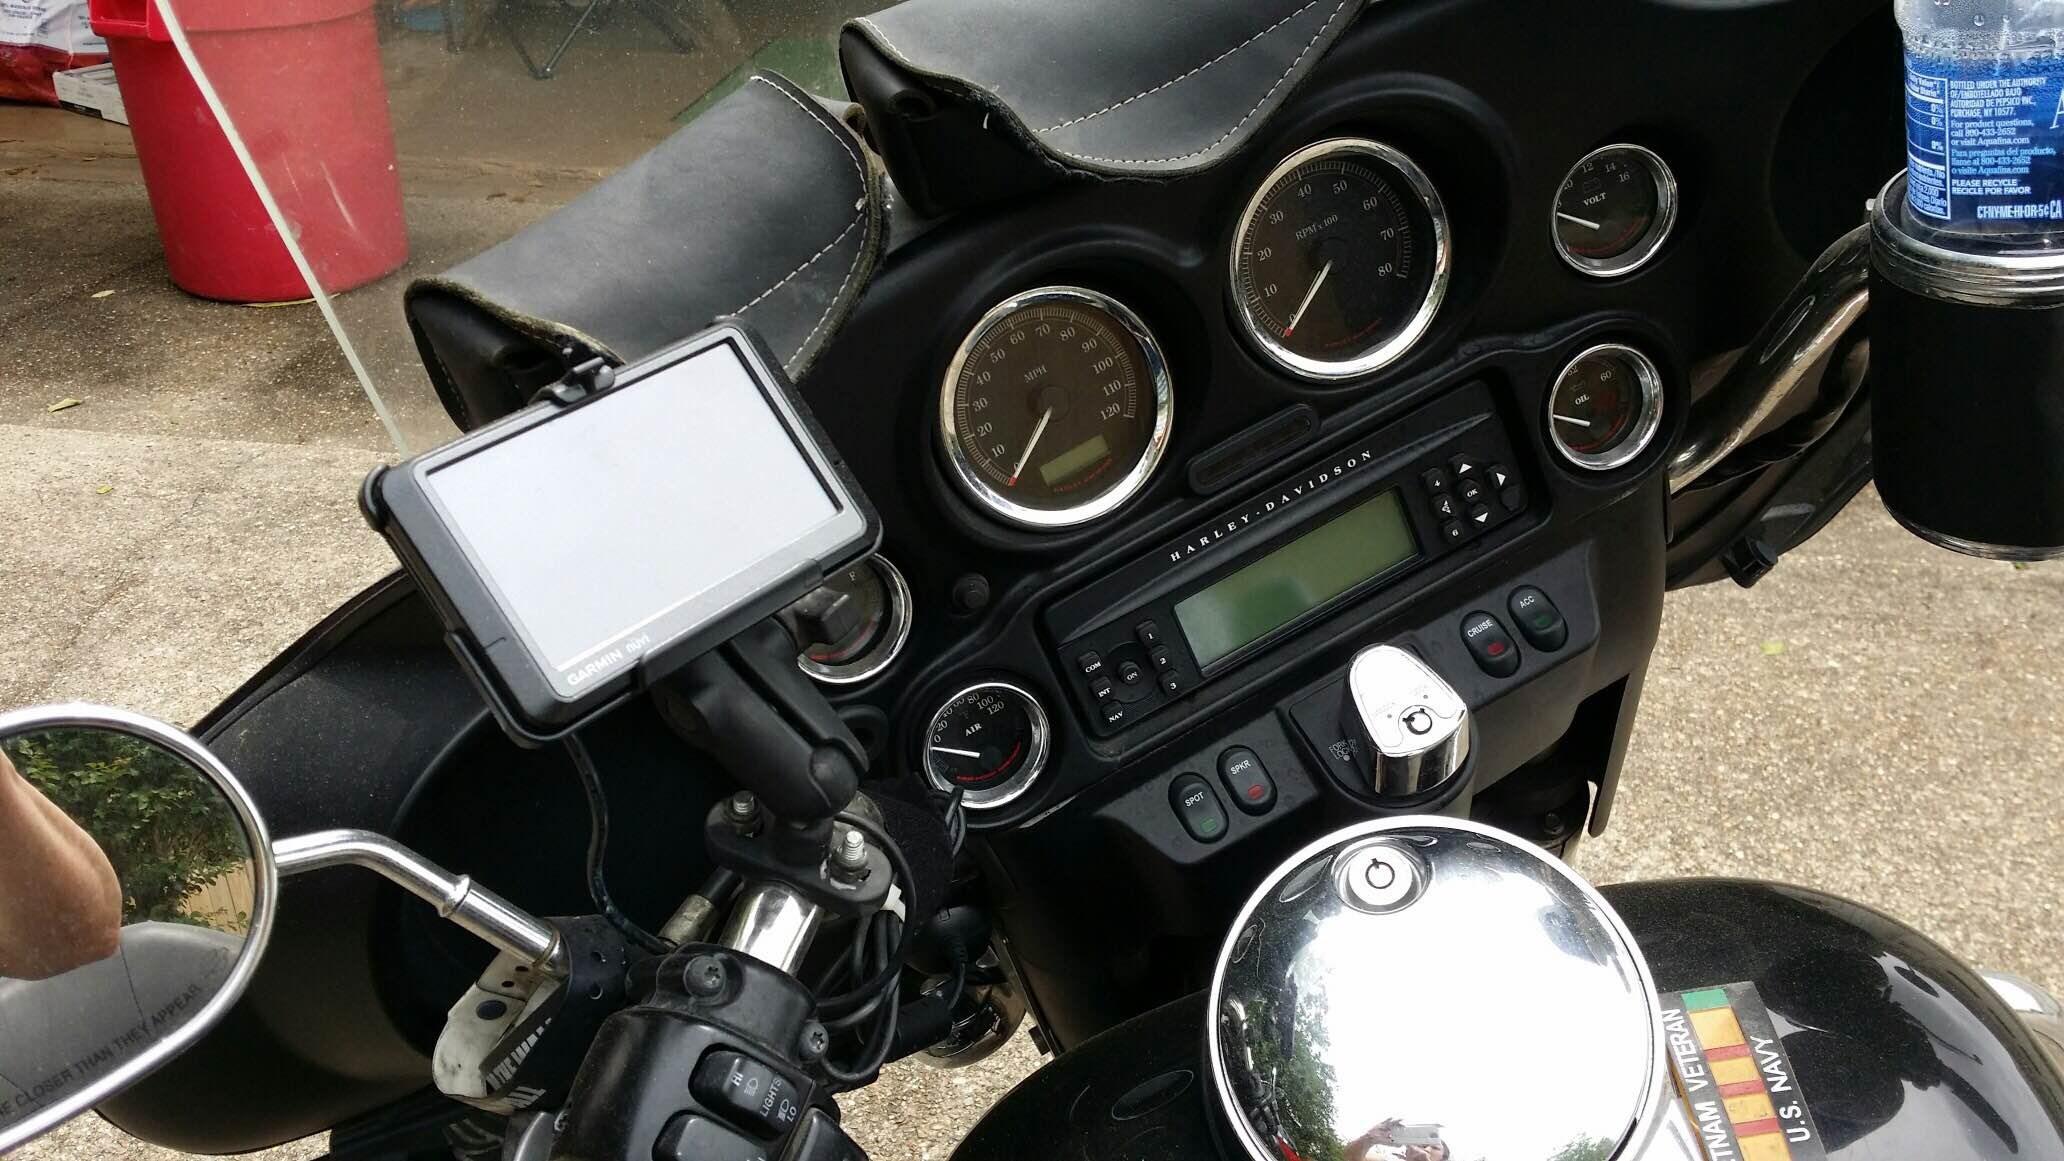 Harley Dealer Baytown Tx >> 2008 Harley-Davidson® FLHTCUSE3 Screamin' Eagle Ultra Classic® (Black), Baytown, Texas (628902 ...